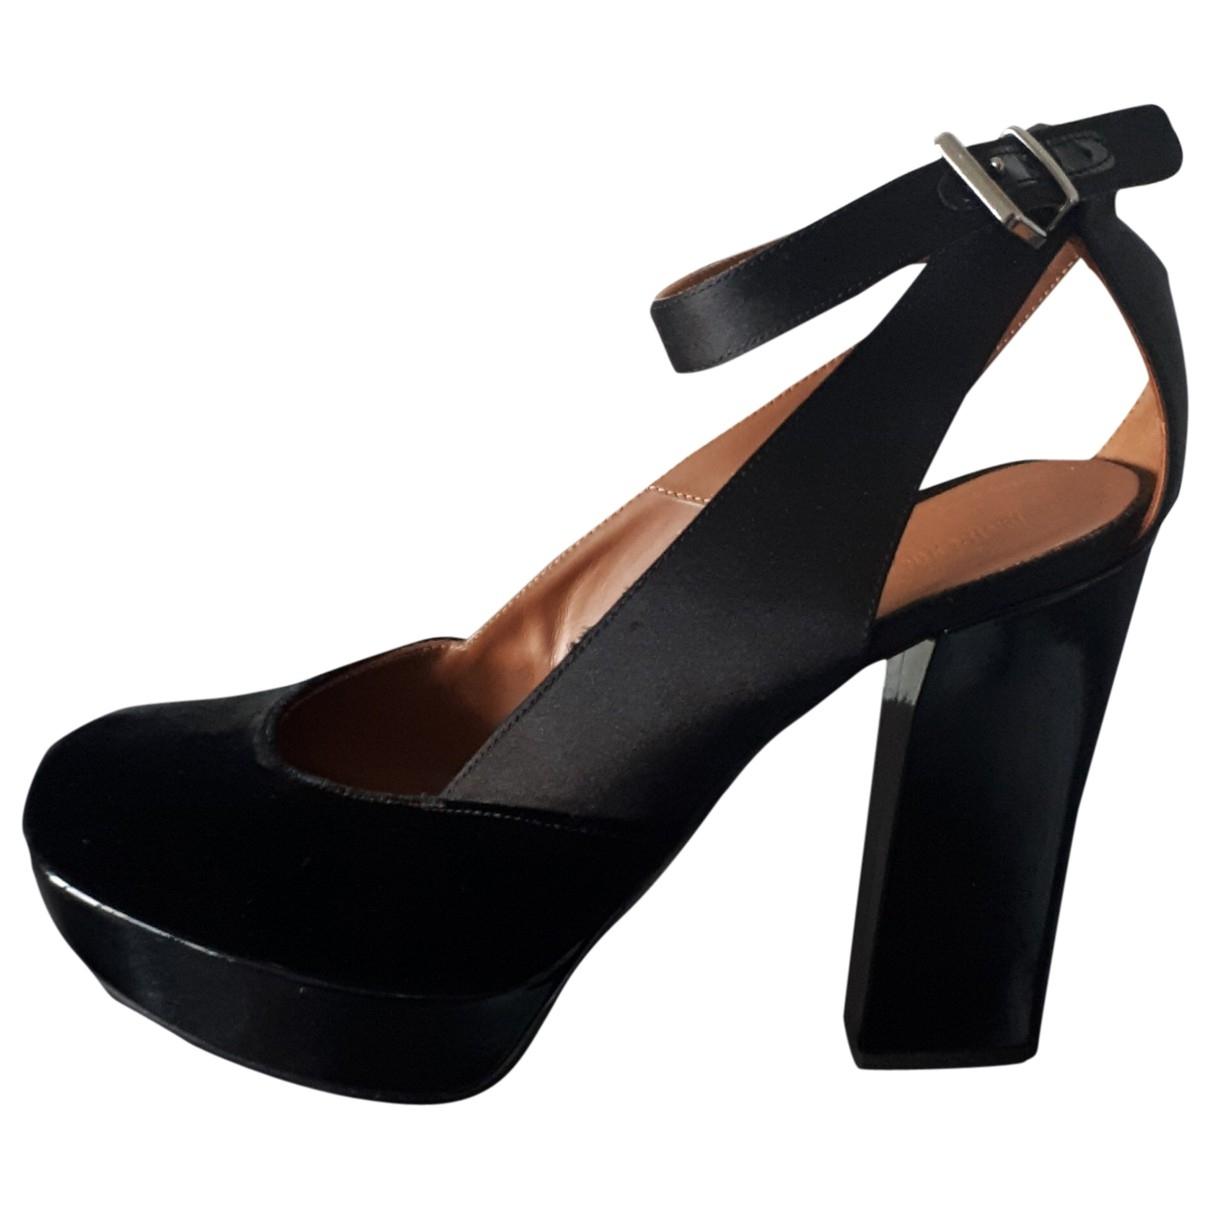 Emporio Armani \N Black Cloth Heels for Women 40 EU